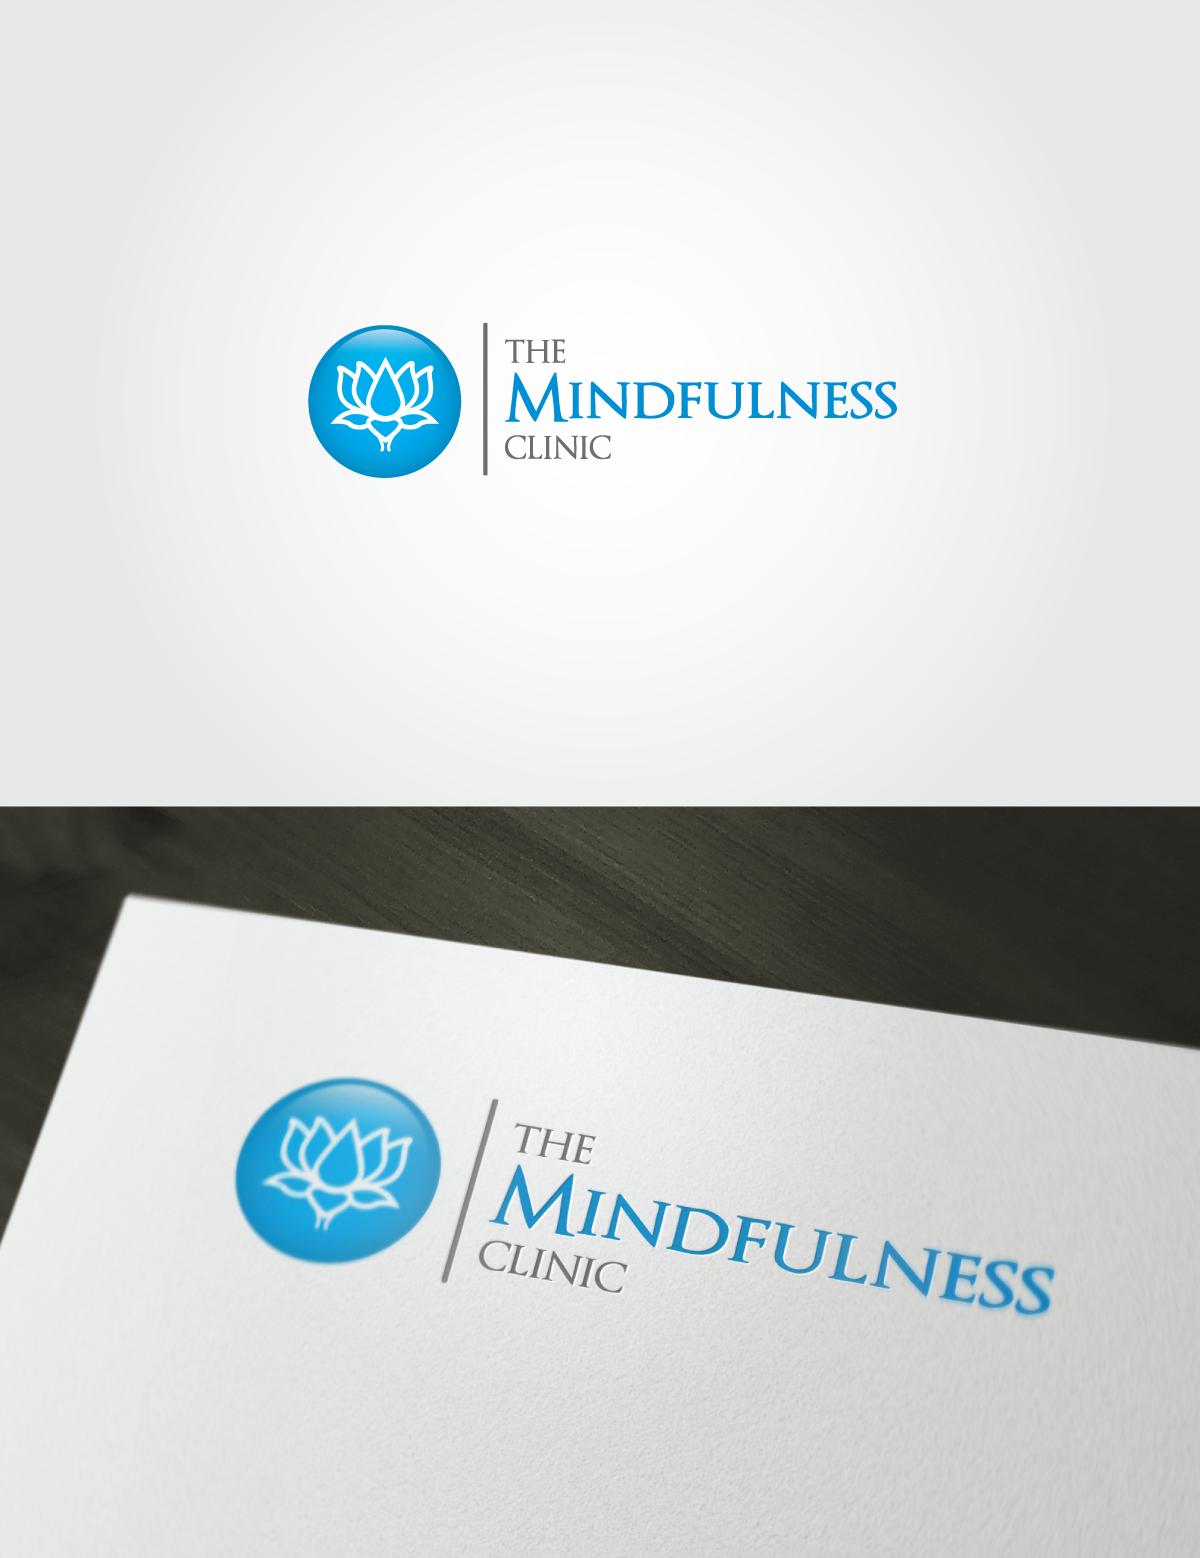 The Mindfulness Clinic needs a new logo